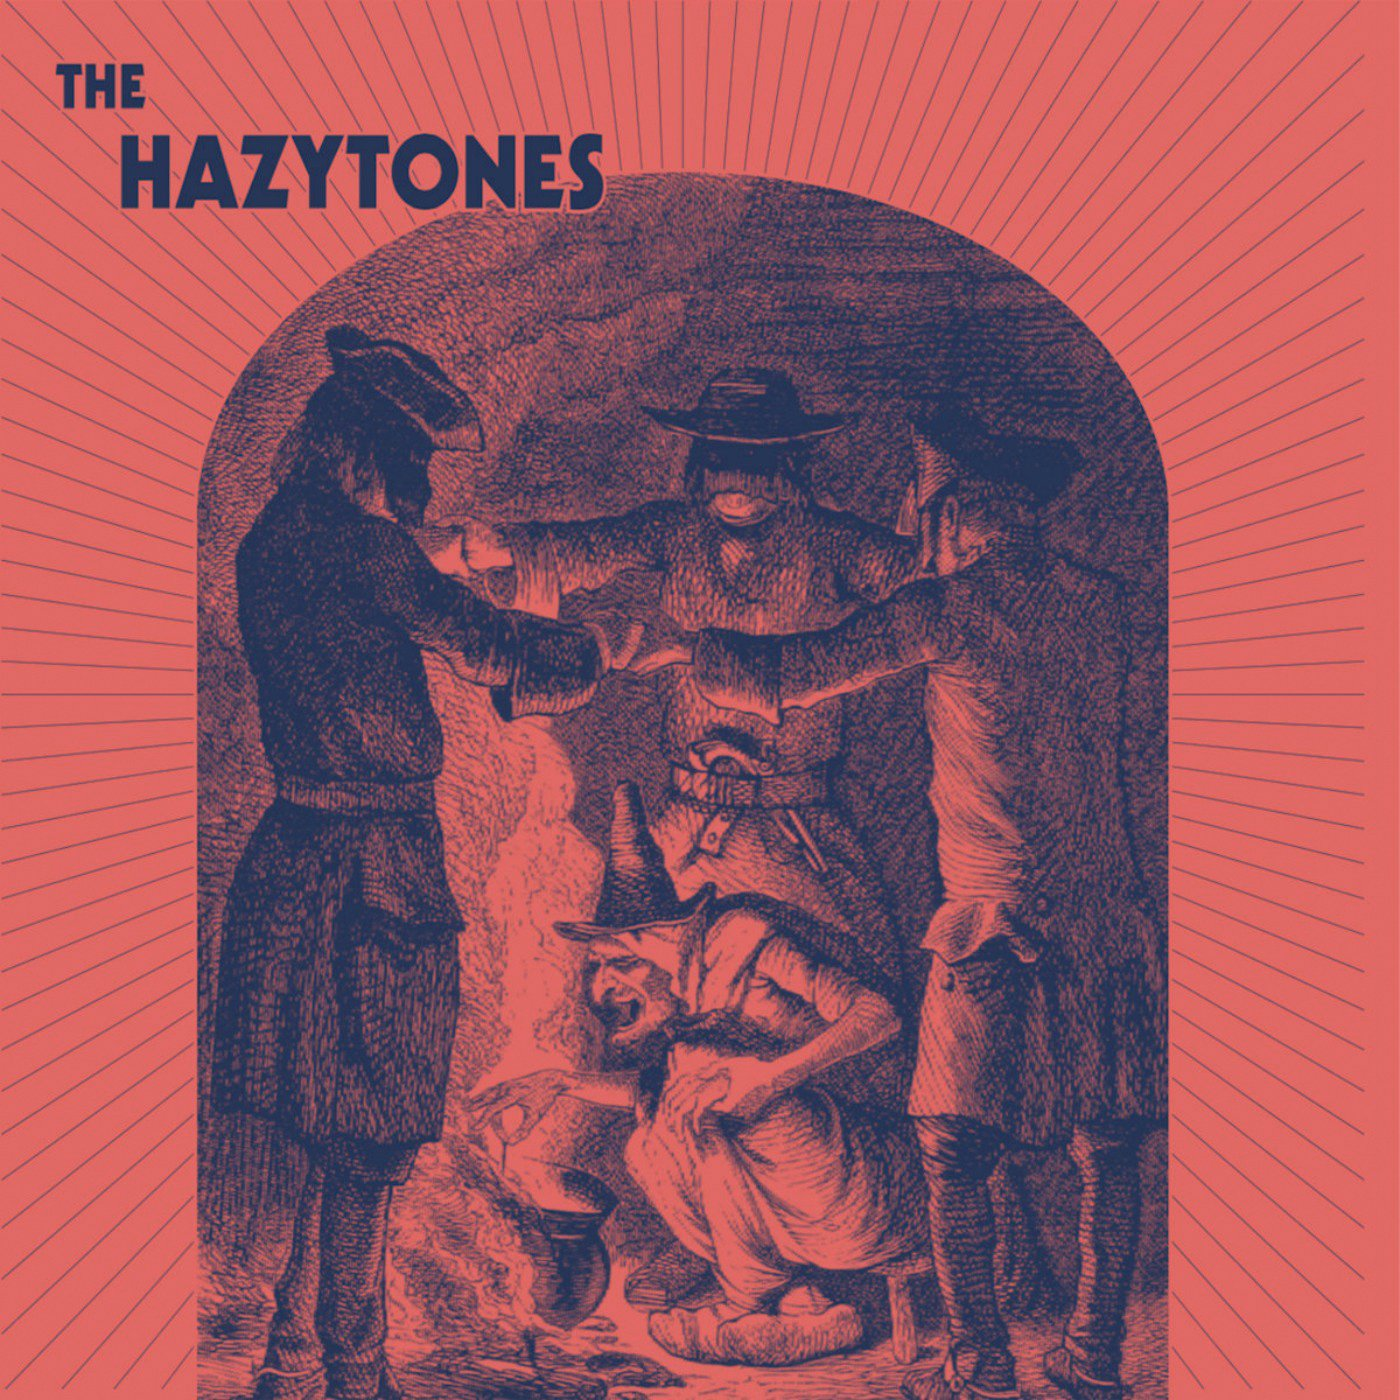 Vinilo : Hazytones - Hazytones (LP Vinyl)